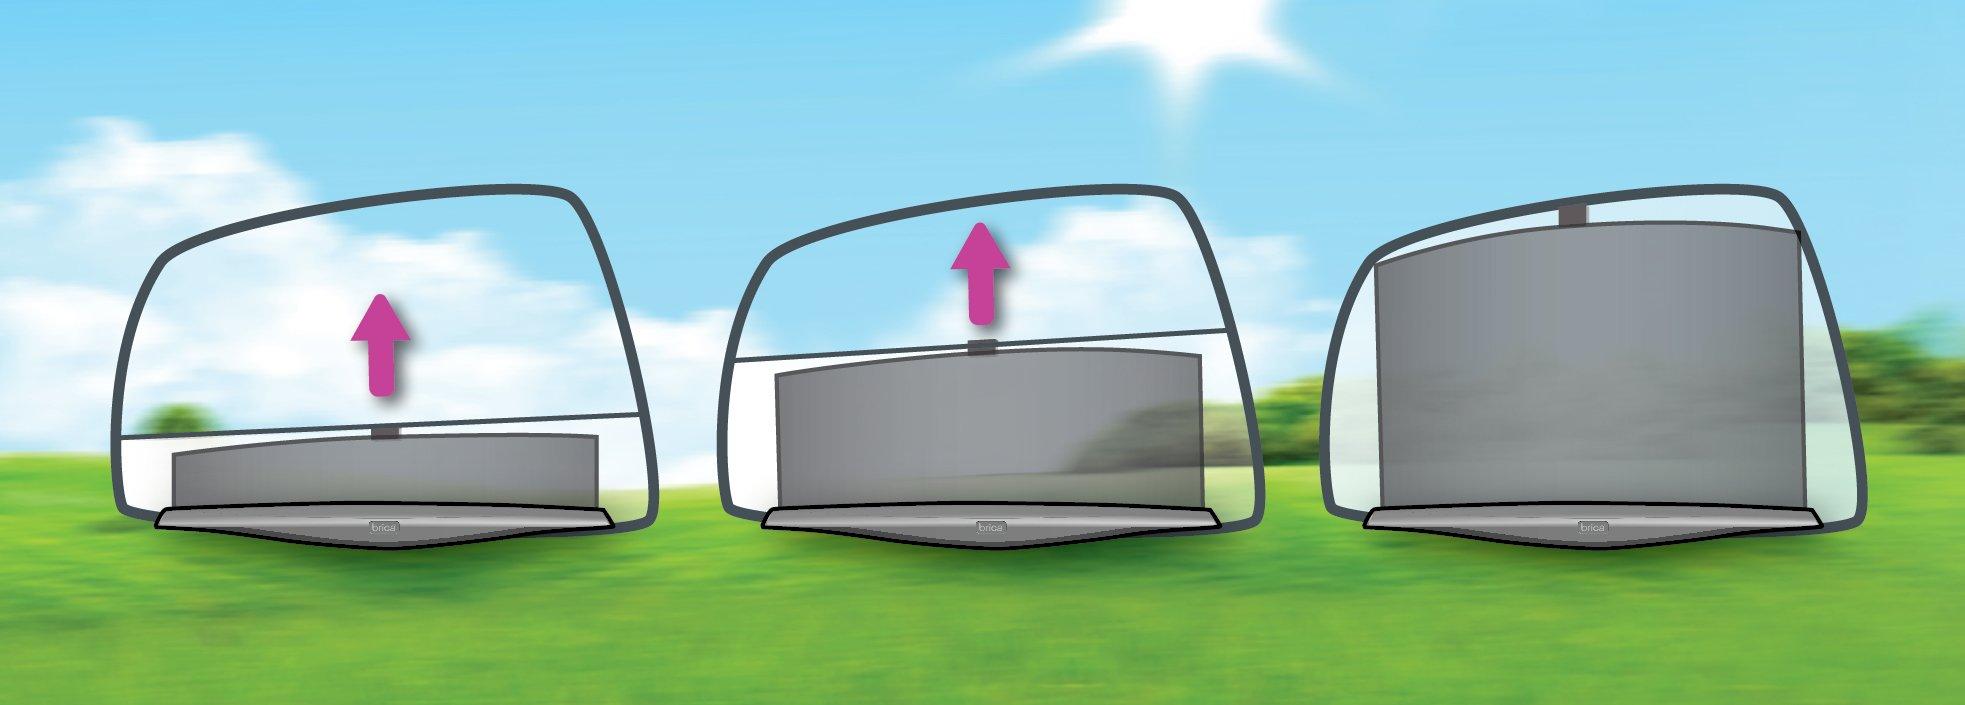 Munchkin Brica Smart Window Shade Rolls Up and Down with Window, Helps Block UVA/UVB Rays, Black by Munchkin